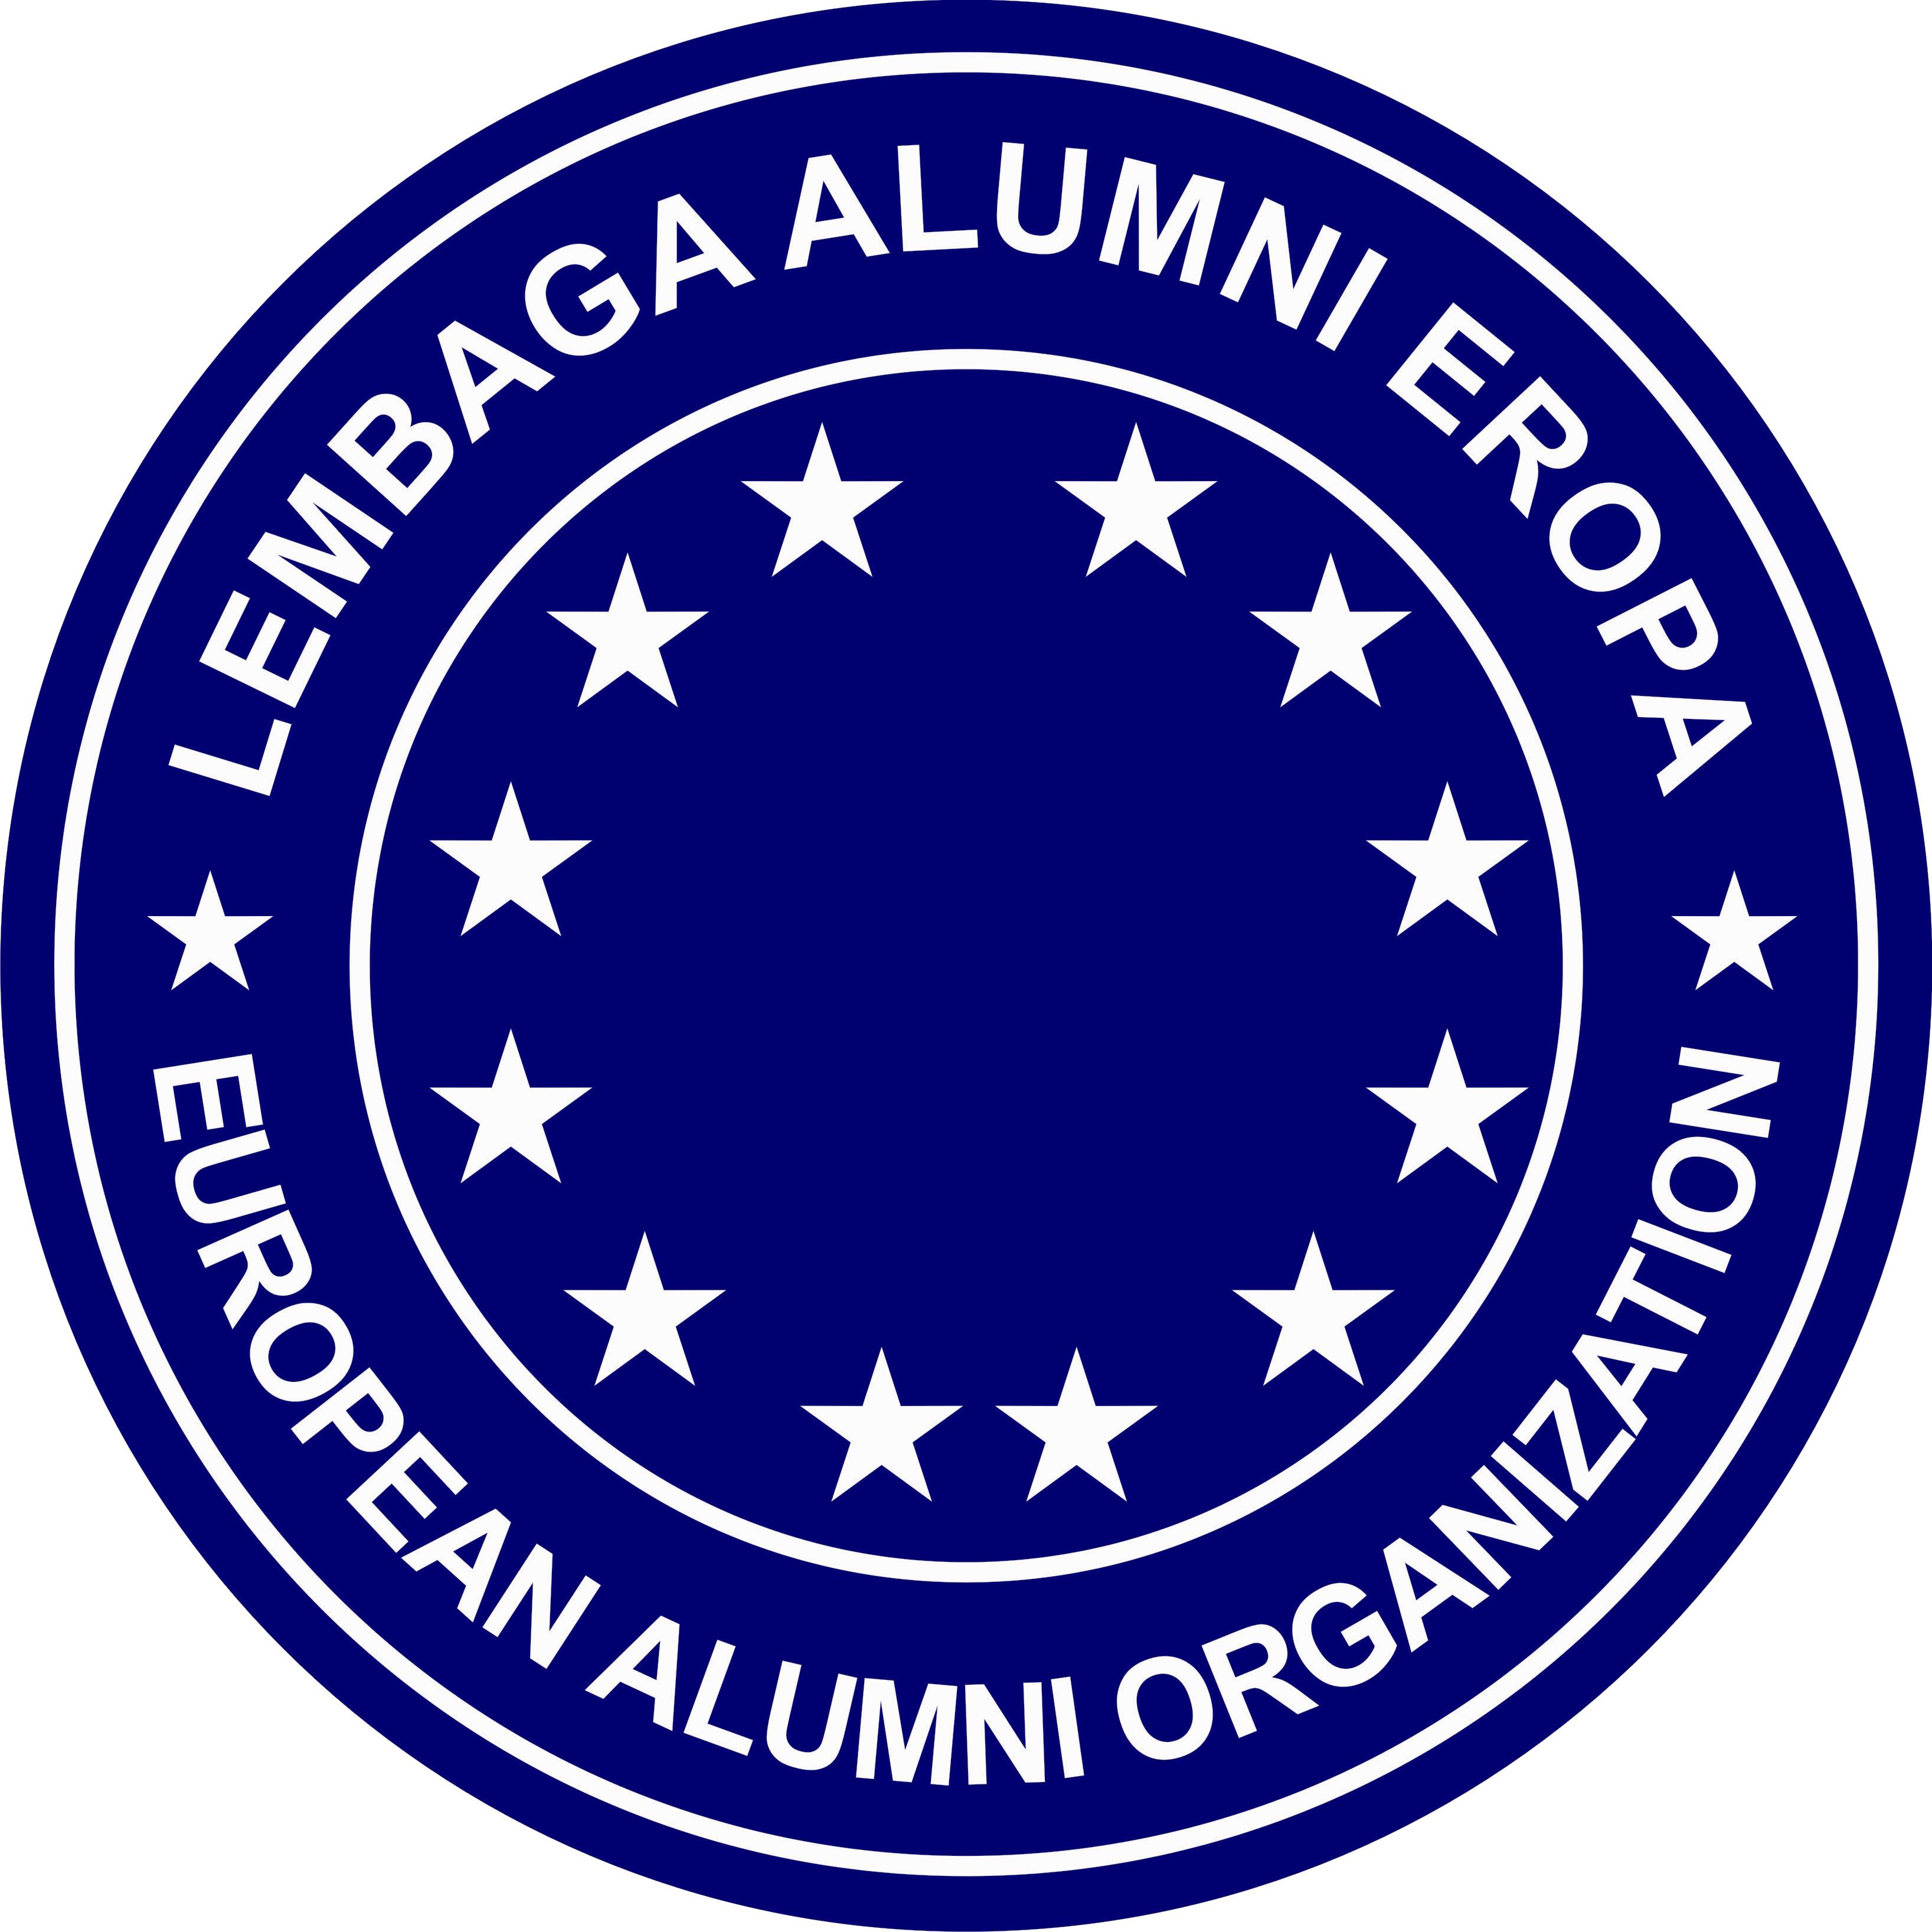 Lembaga Alumni Eropa